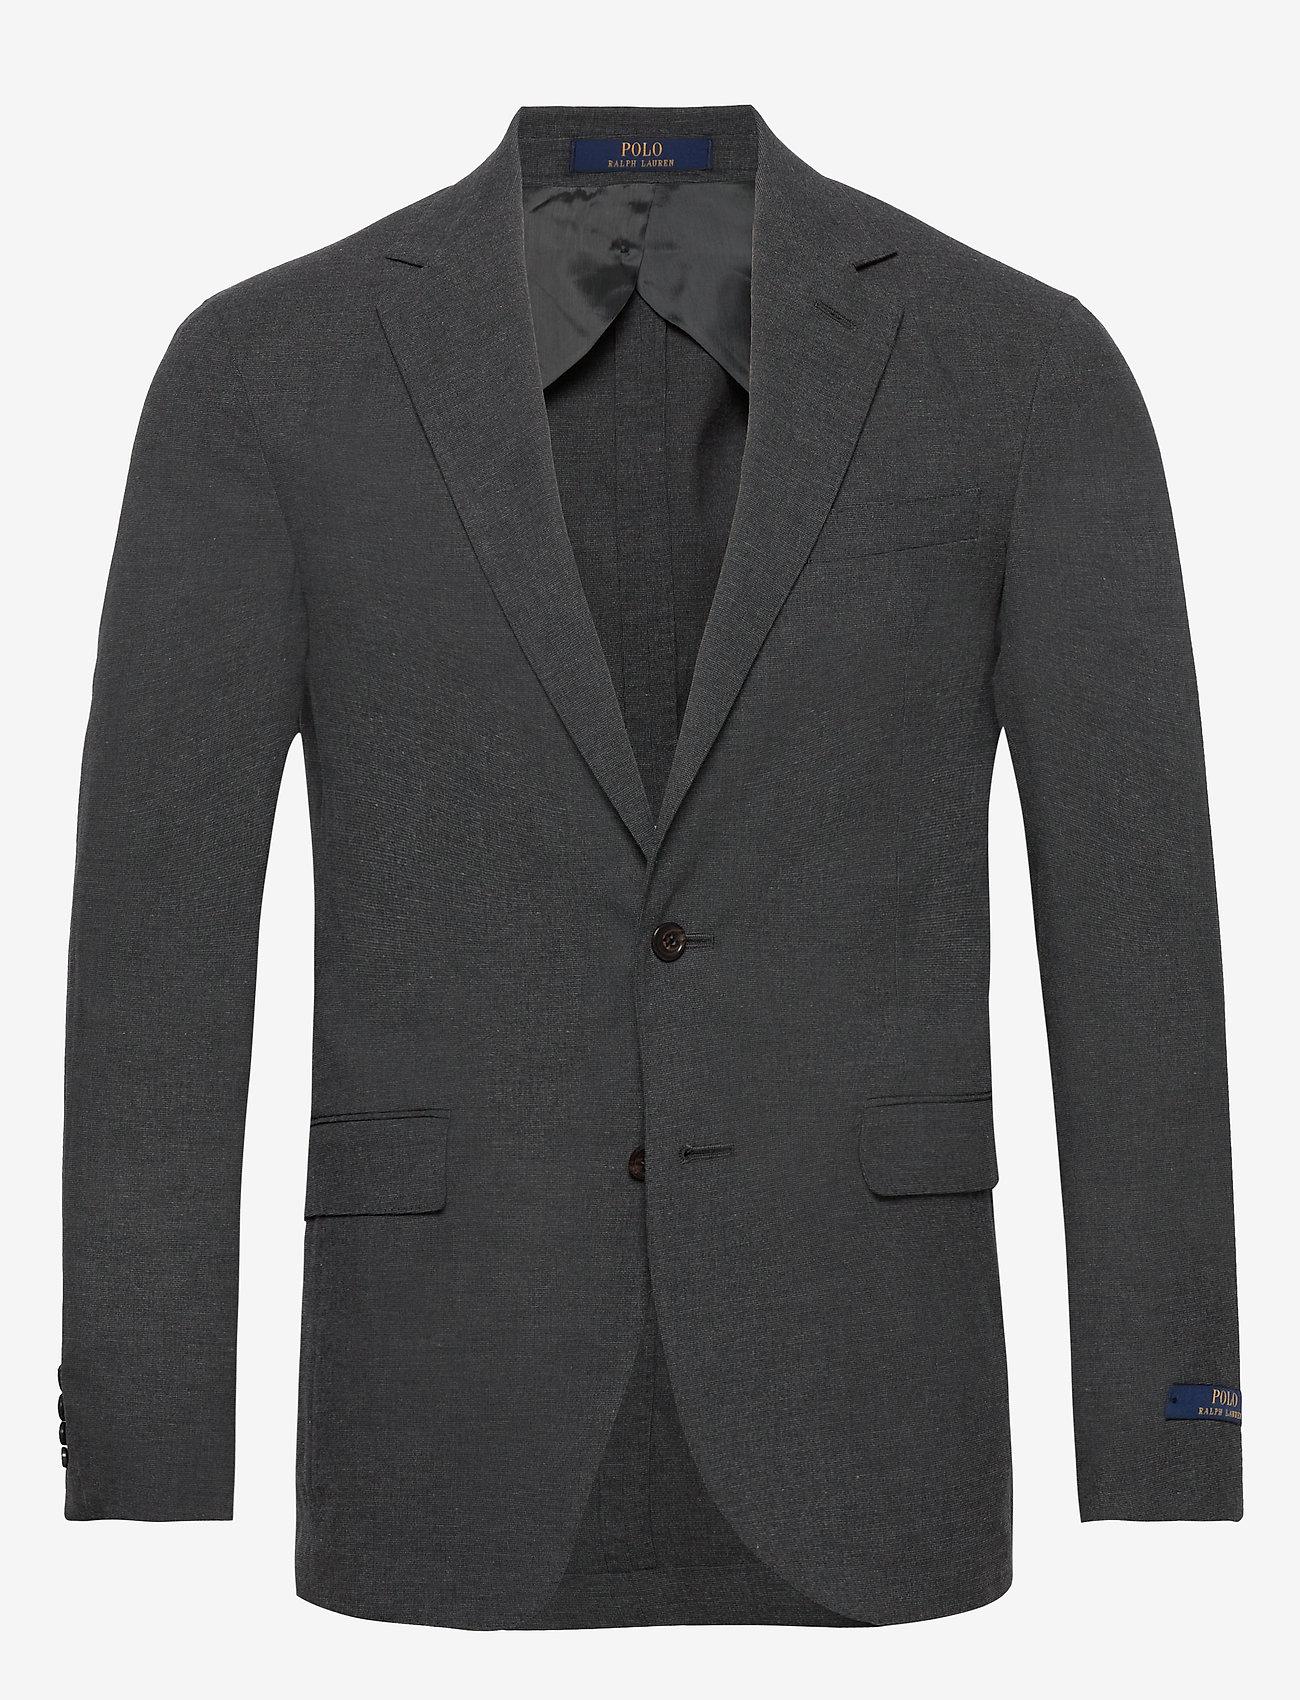 Polo Ralph Lauren - SOFT MICRO FANCY-P SOFT 2B NOTCH UC - enkelknäppta kavajer - medium grey - 0